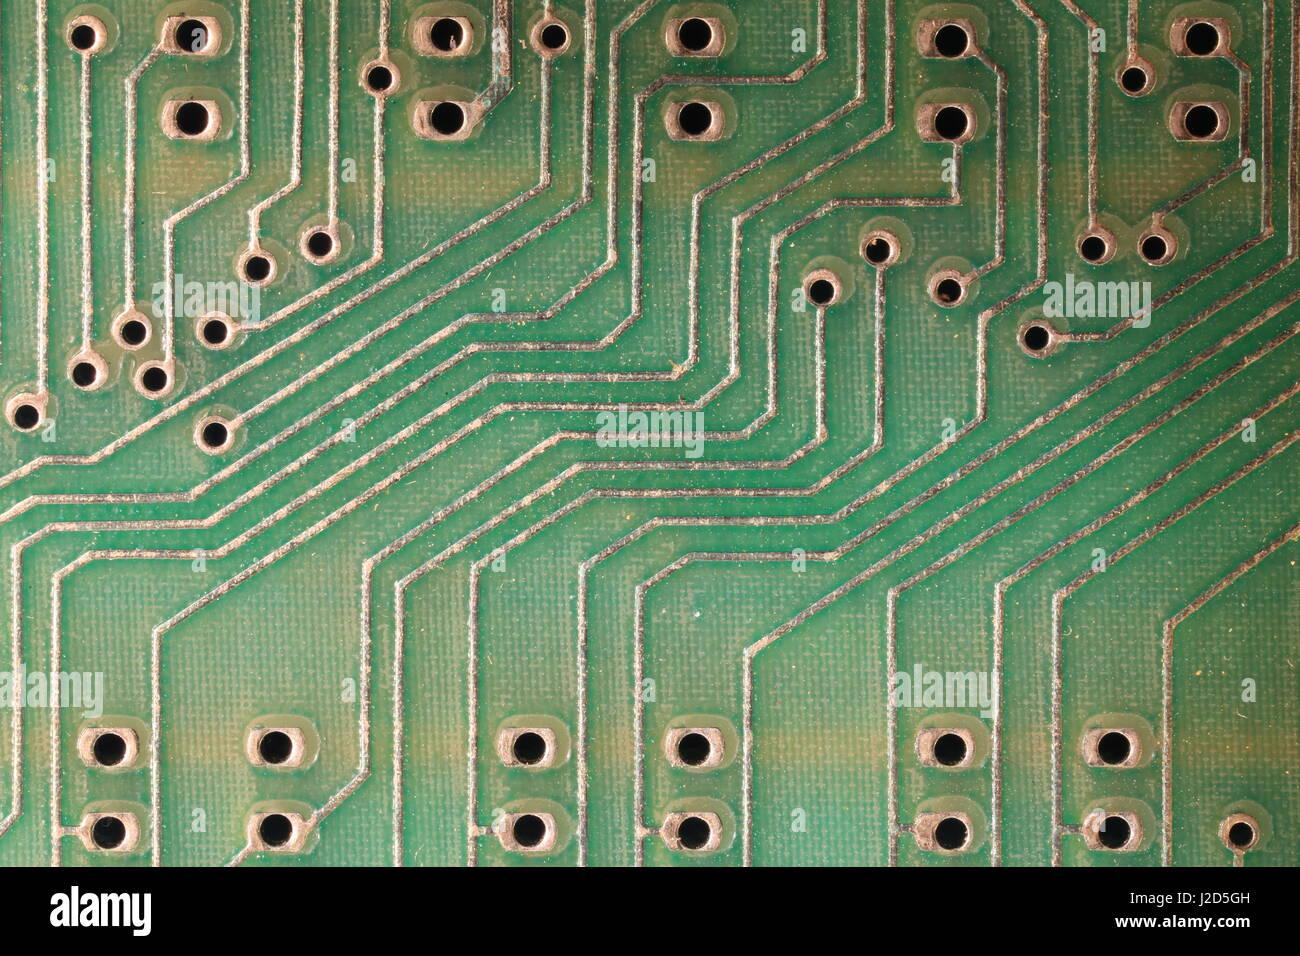 Circuits sur un ordinateur de circuits imprimés (PCB) Photo Stock